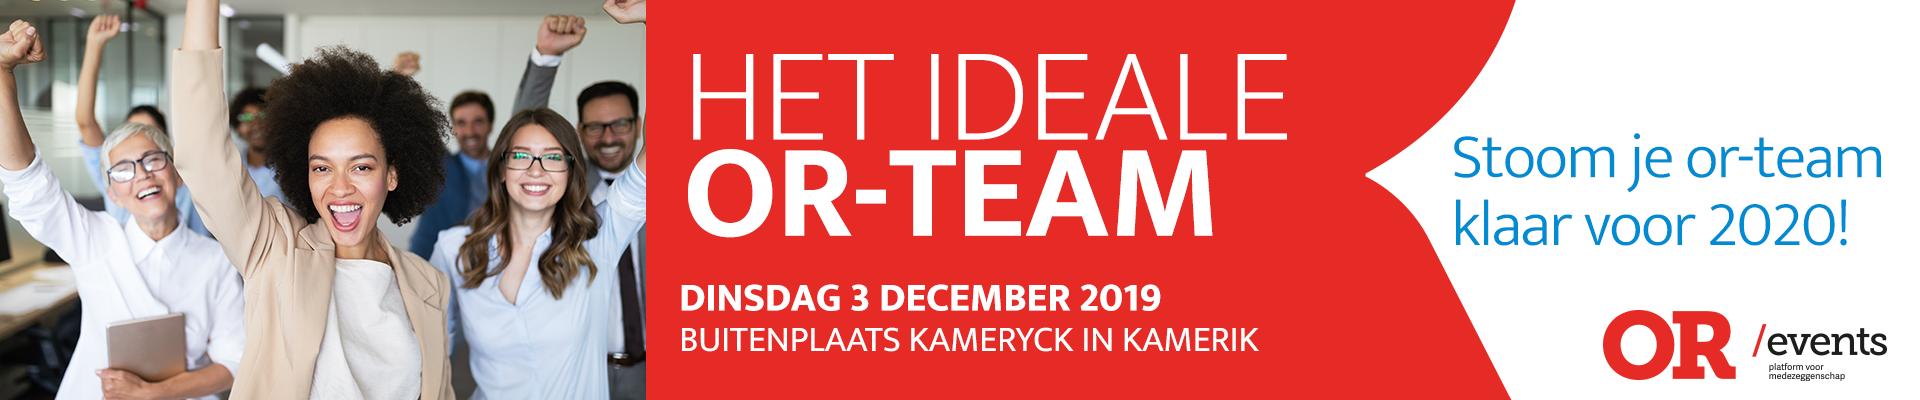 Het ideale or-team  3 december 2019